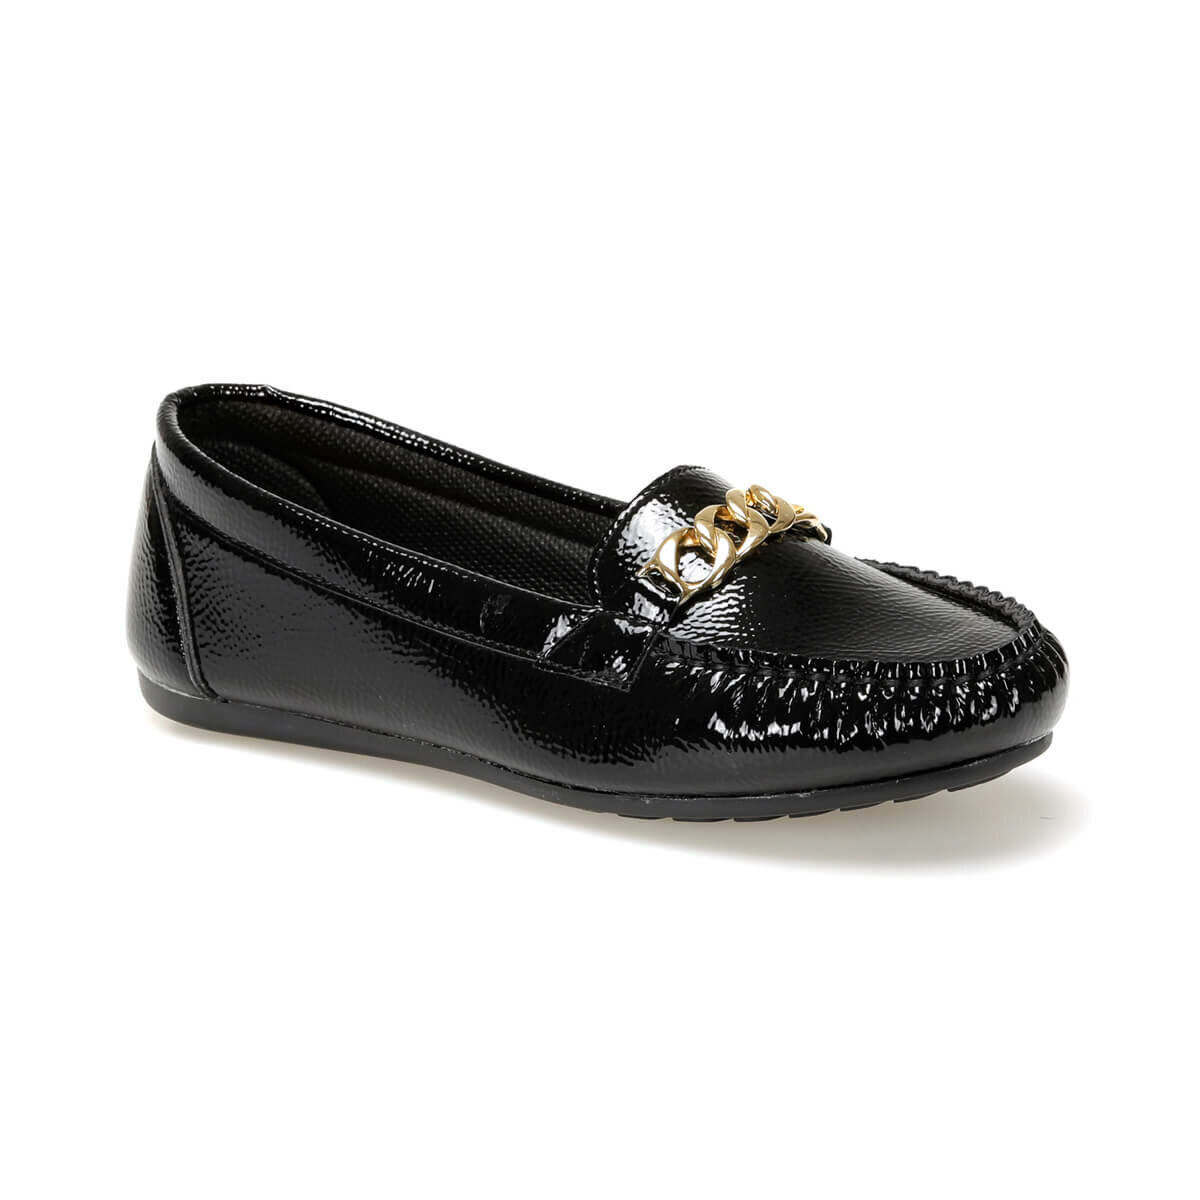 Flo dw19006r preto sapatos femininos miss f